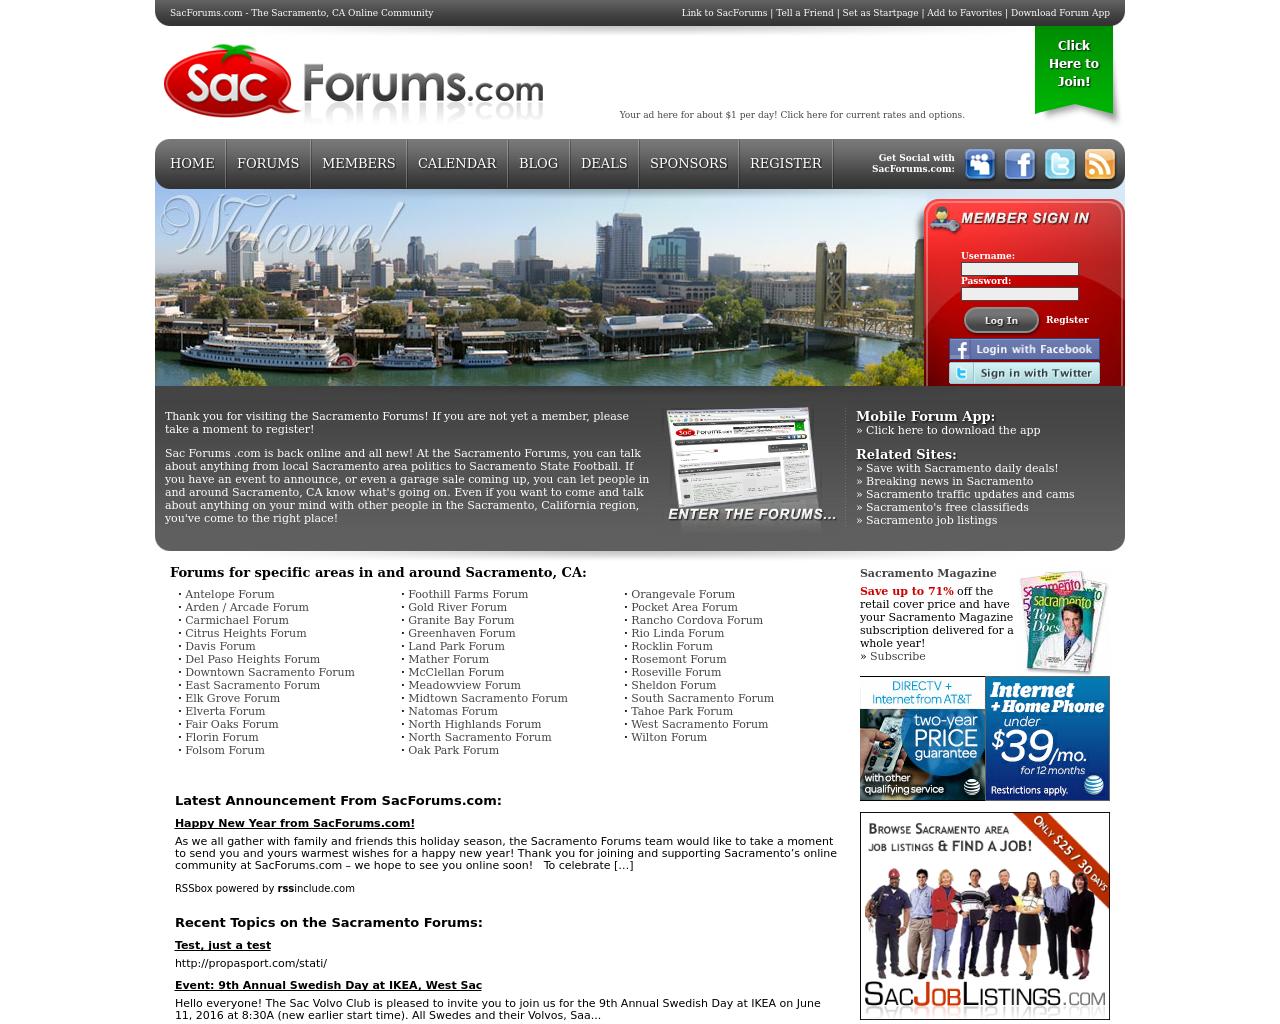 SAC-Forums-Advertising-Reviews-Pricing